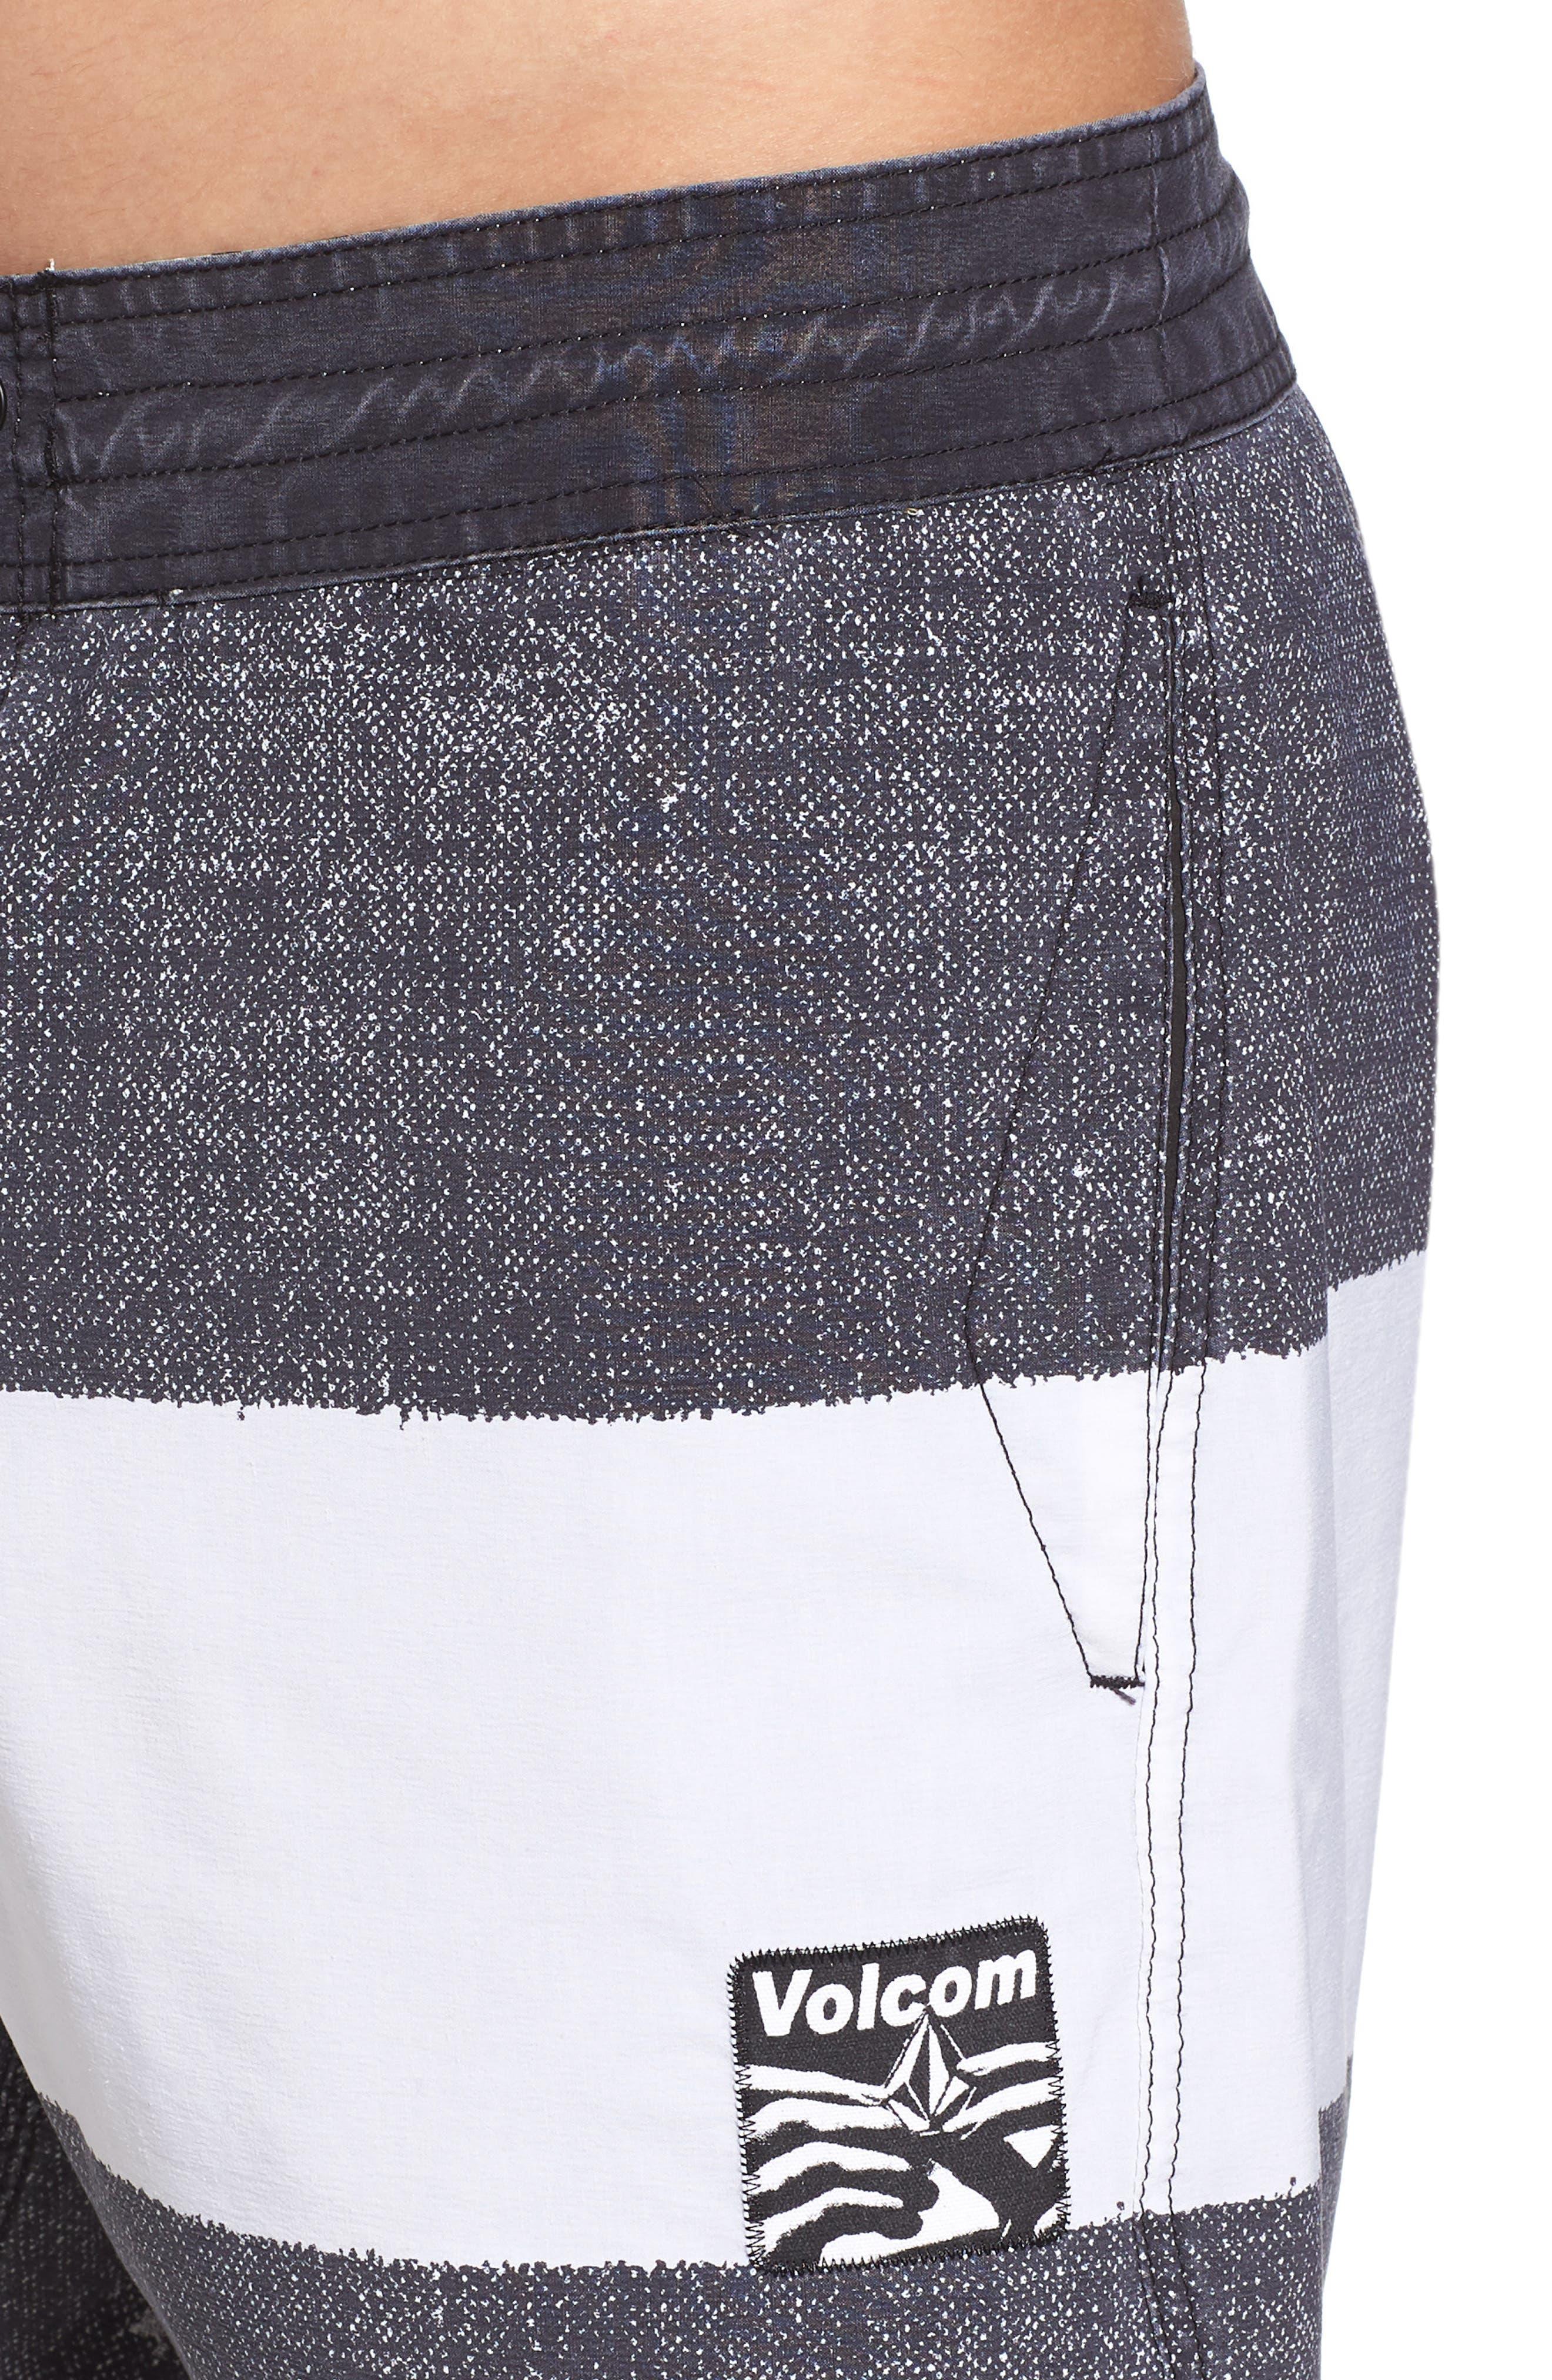 Balbroa Stoney Board Shorts,                             Alternate thumbnail 4, color,                             Stealth